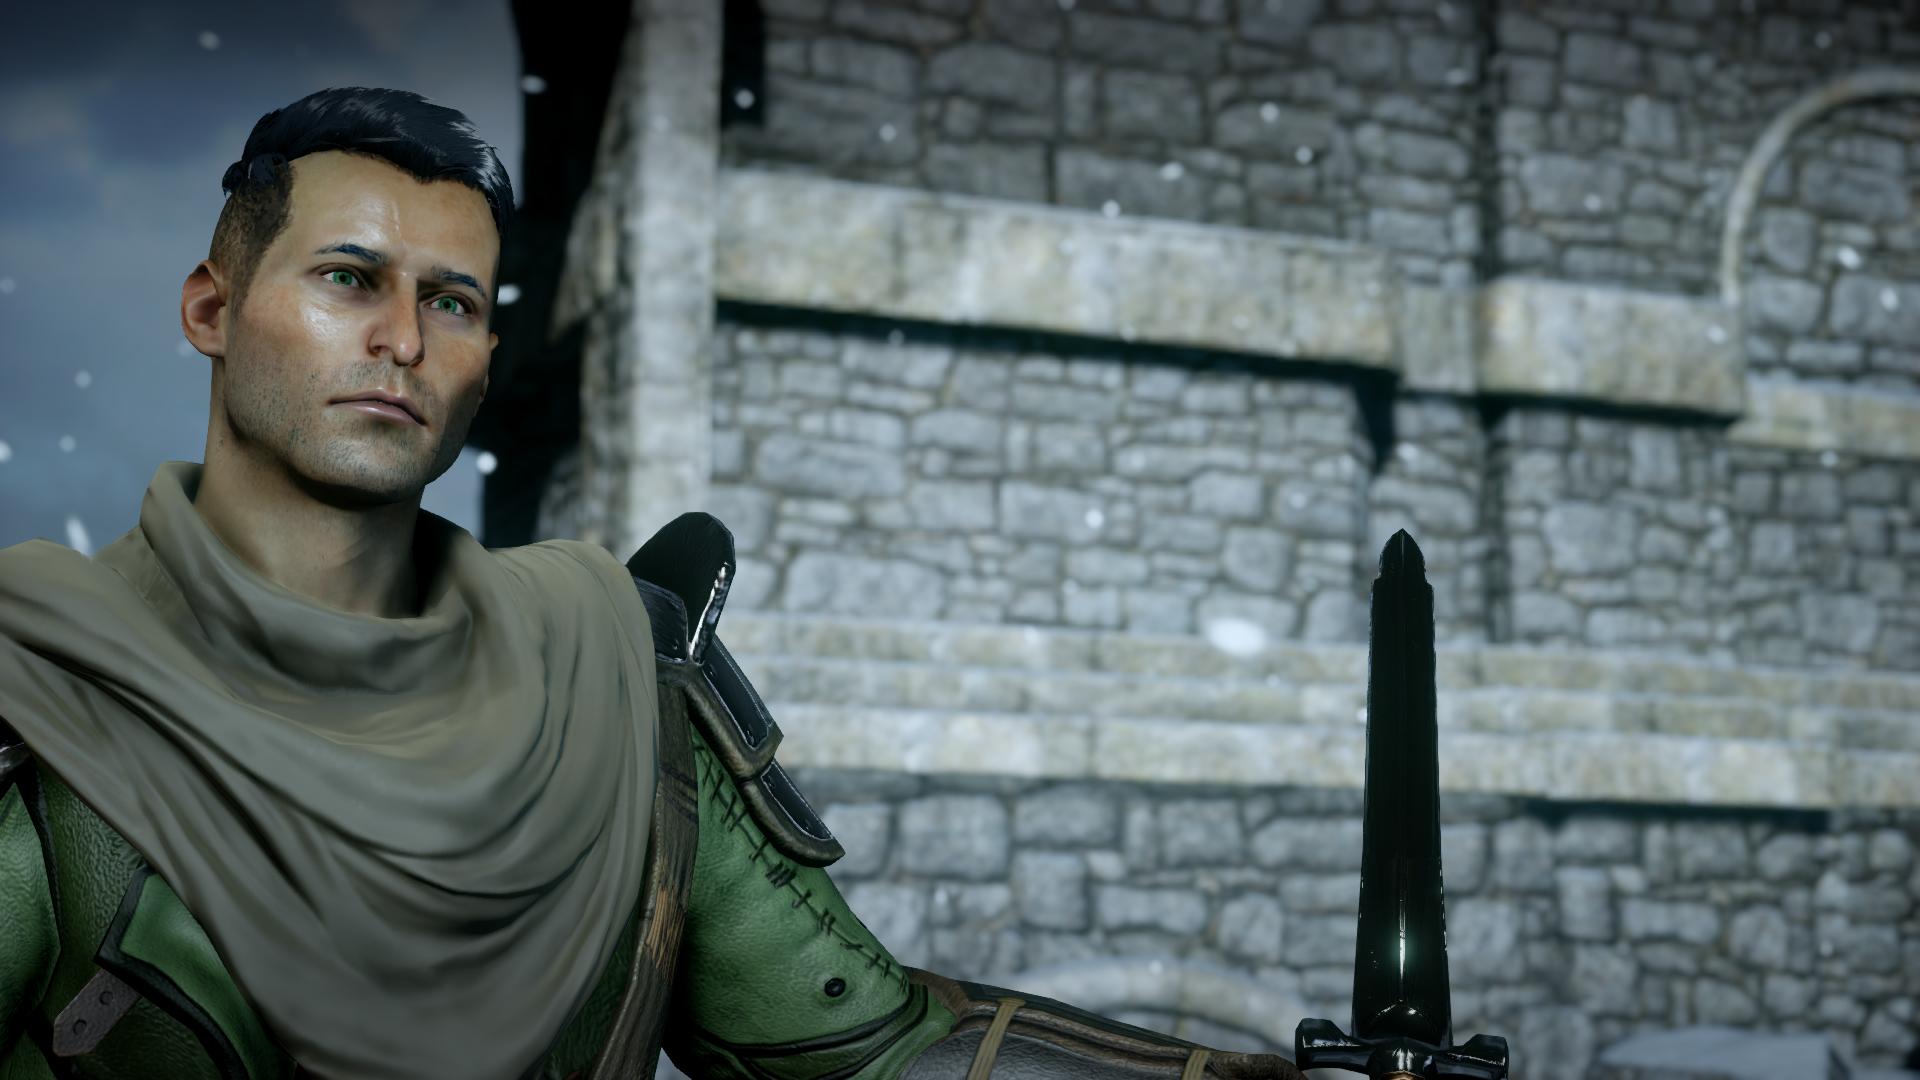 Inquisitor - Artemis by agentsniper